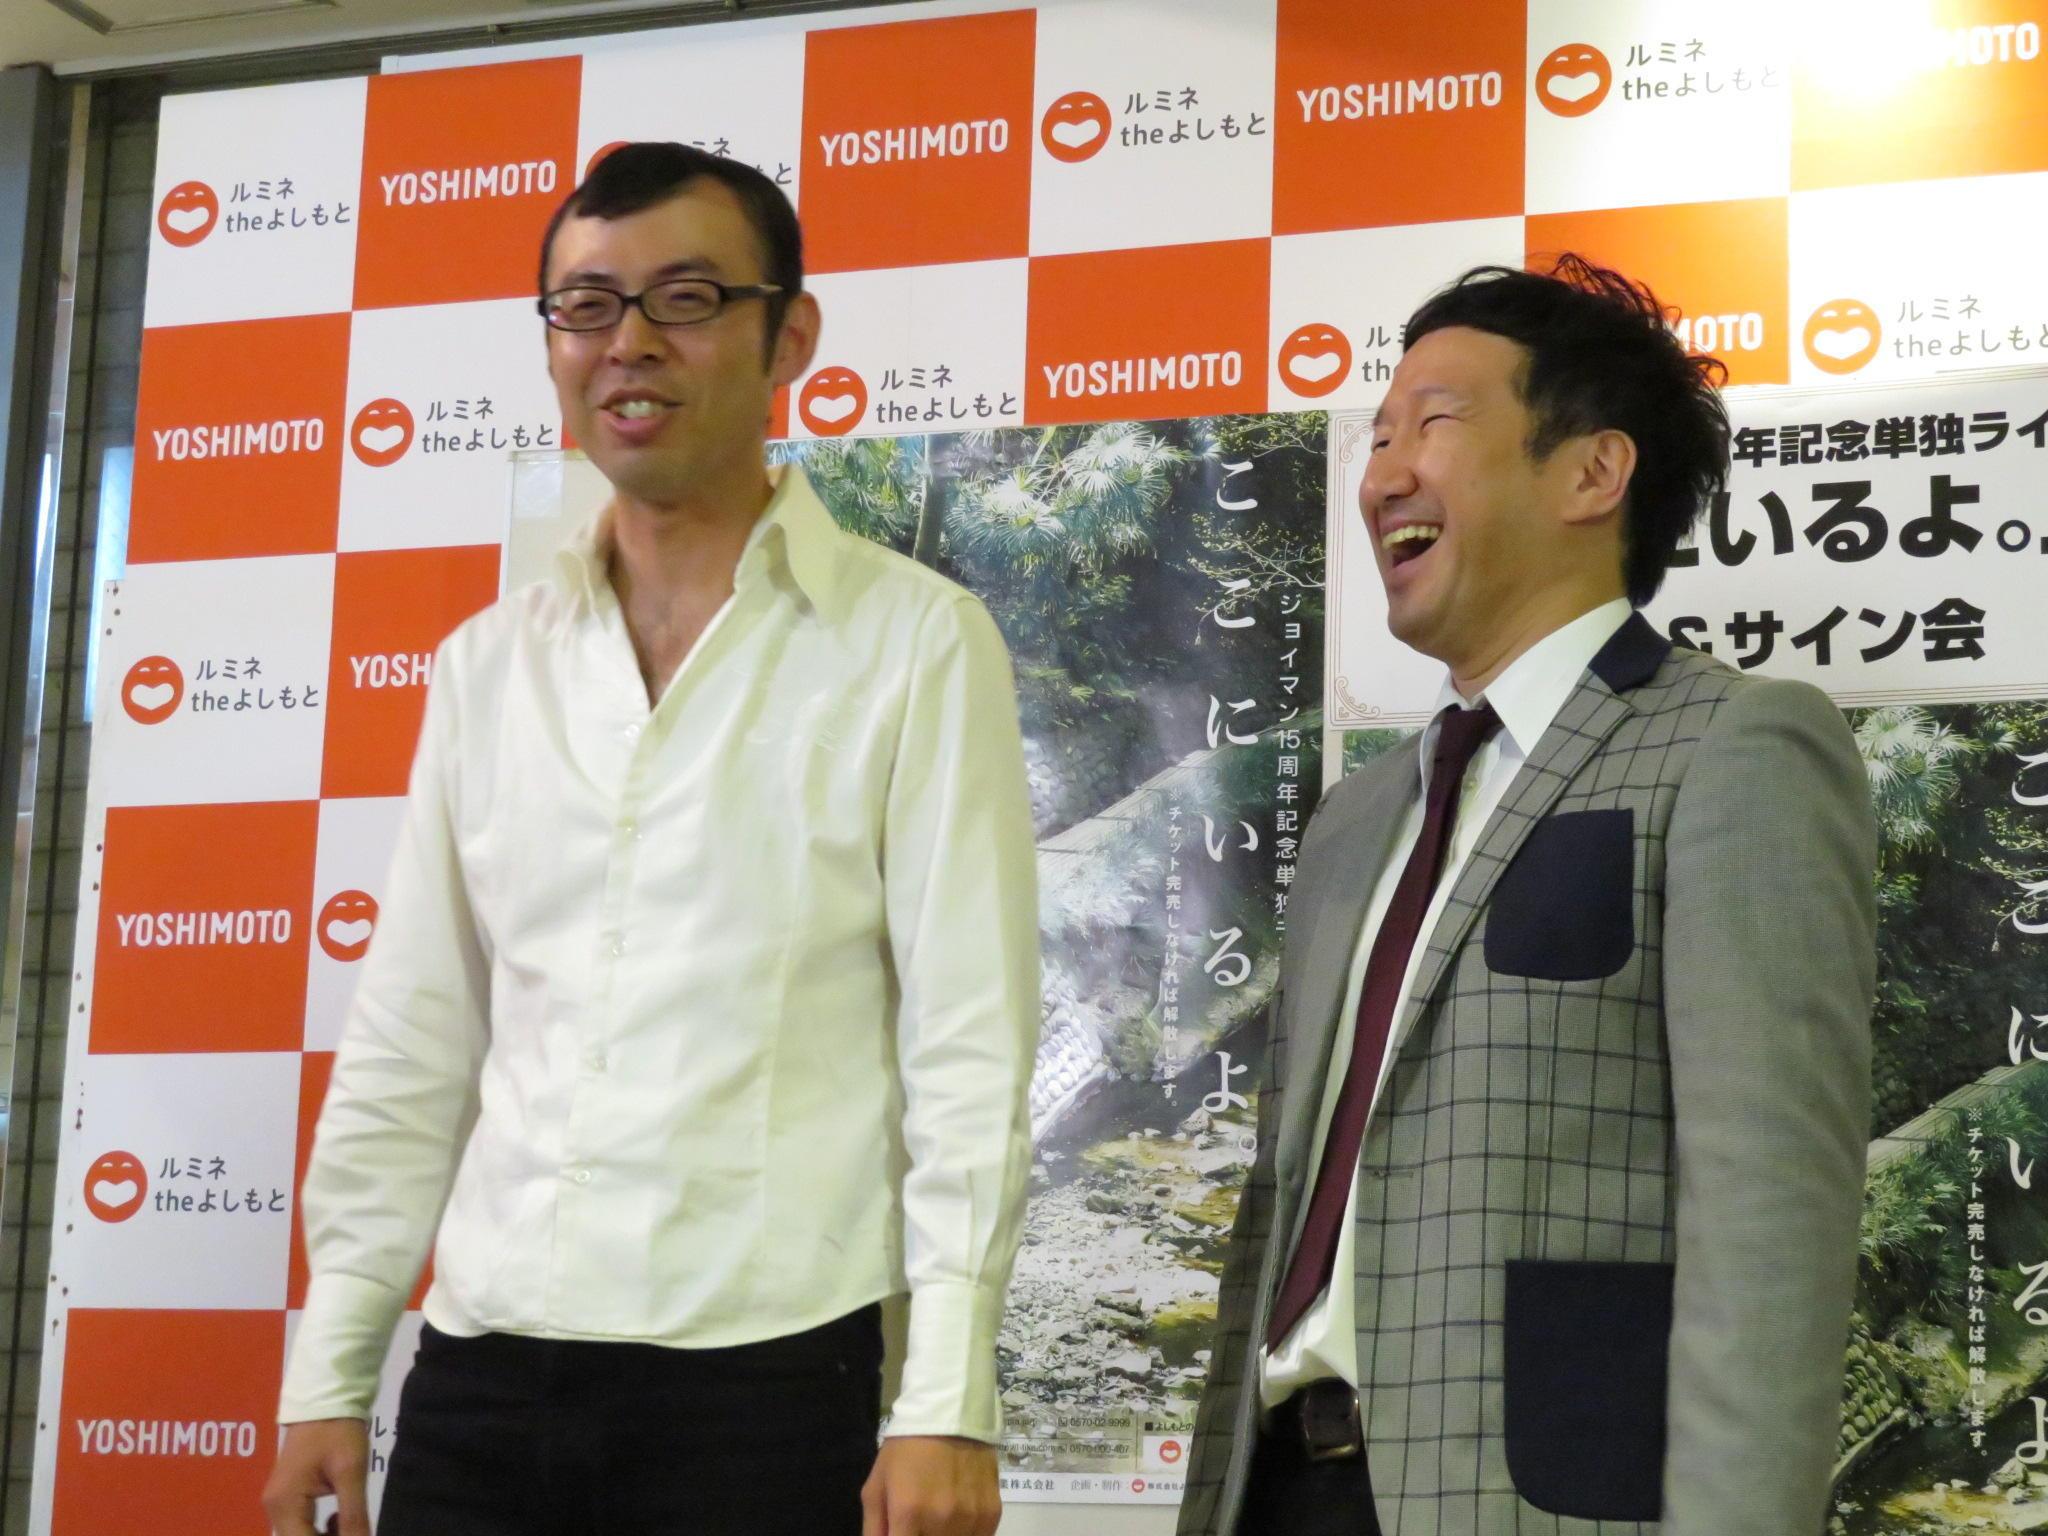 http://news.yoshimoto.co.jp/20180515004201-029ce25a471f94985948edc1864089c8adda08c2.jpg